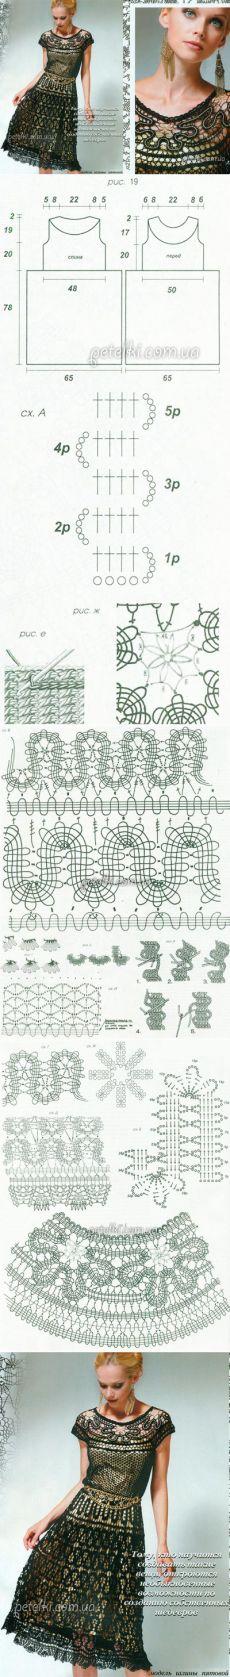 Dress in technology Bruges lace. knitting Schemes description